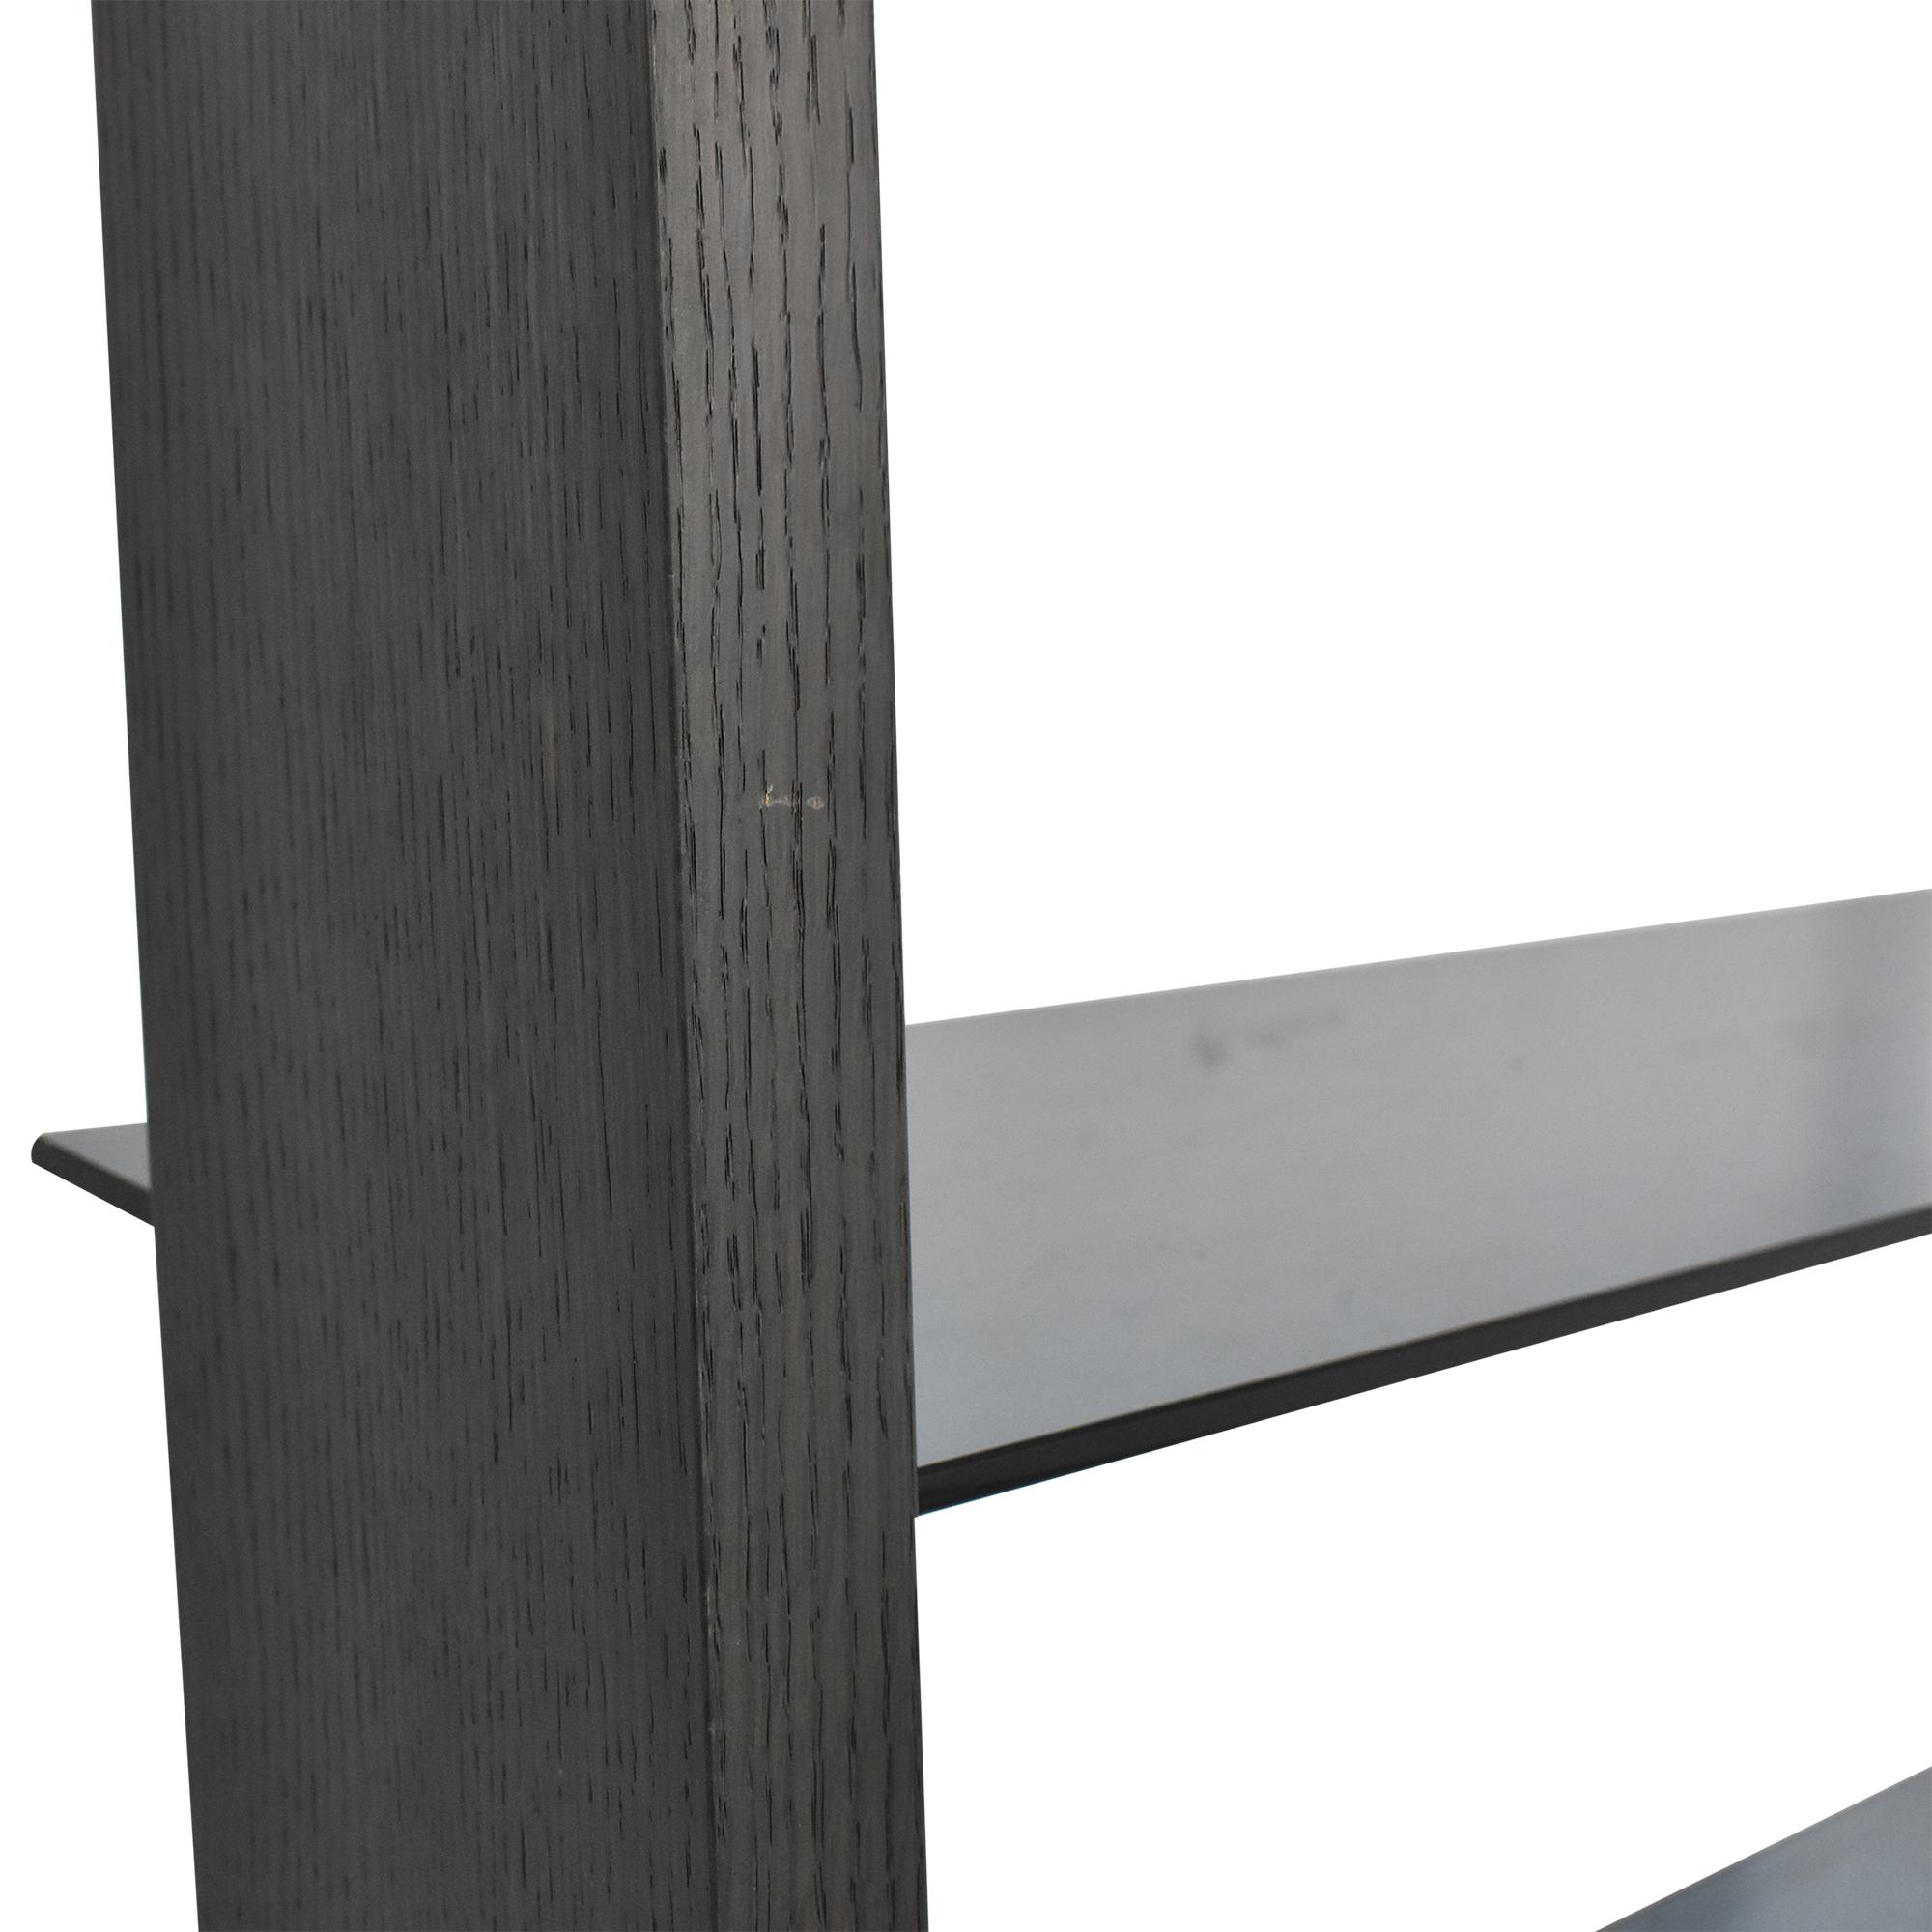 BDI Furniture Jensen-Lewis BDI Eileen Leaning Shelf nyc